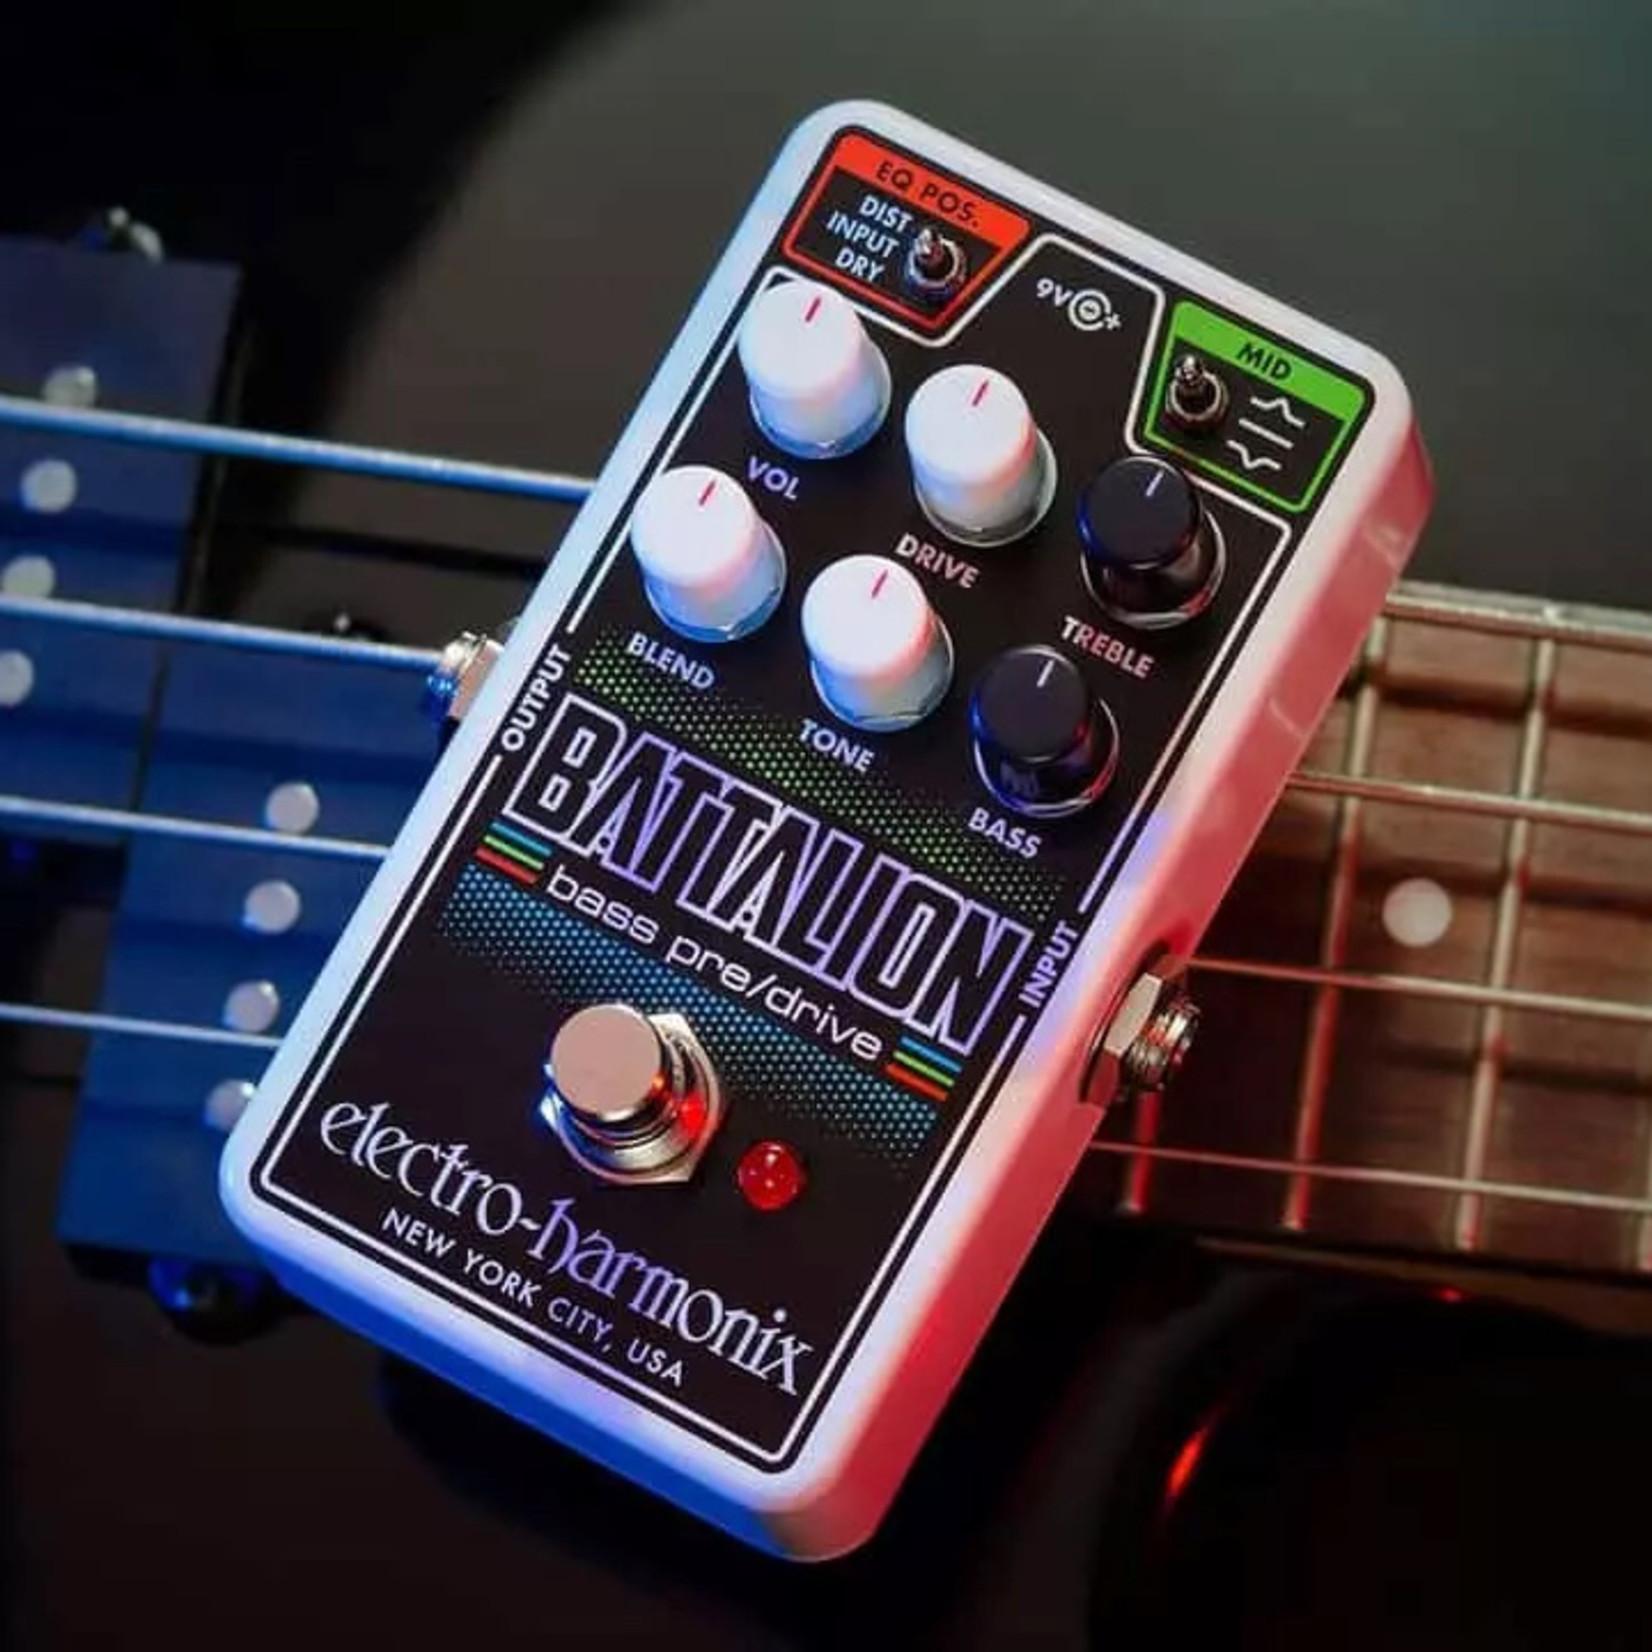 Electro-Harmonix Electro-Harmonix Nano Battalion Bass Preamp & Overdrive